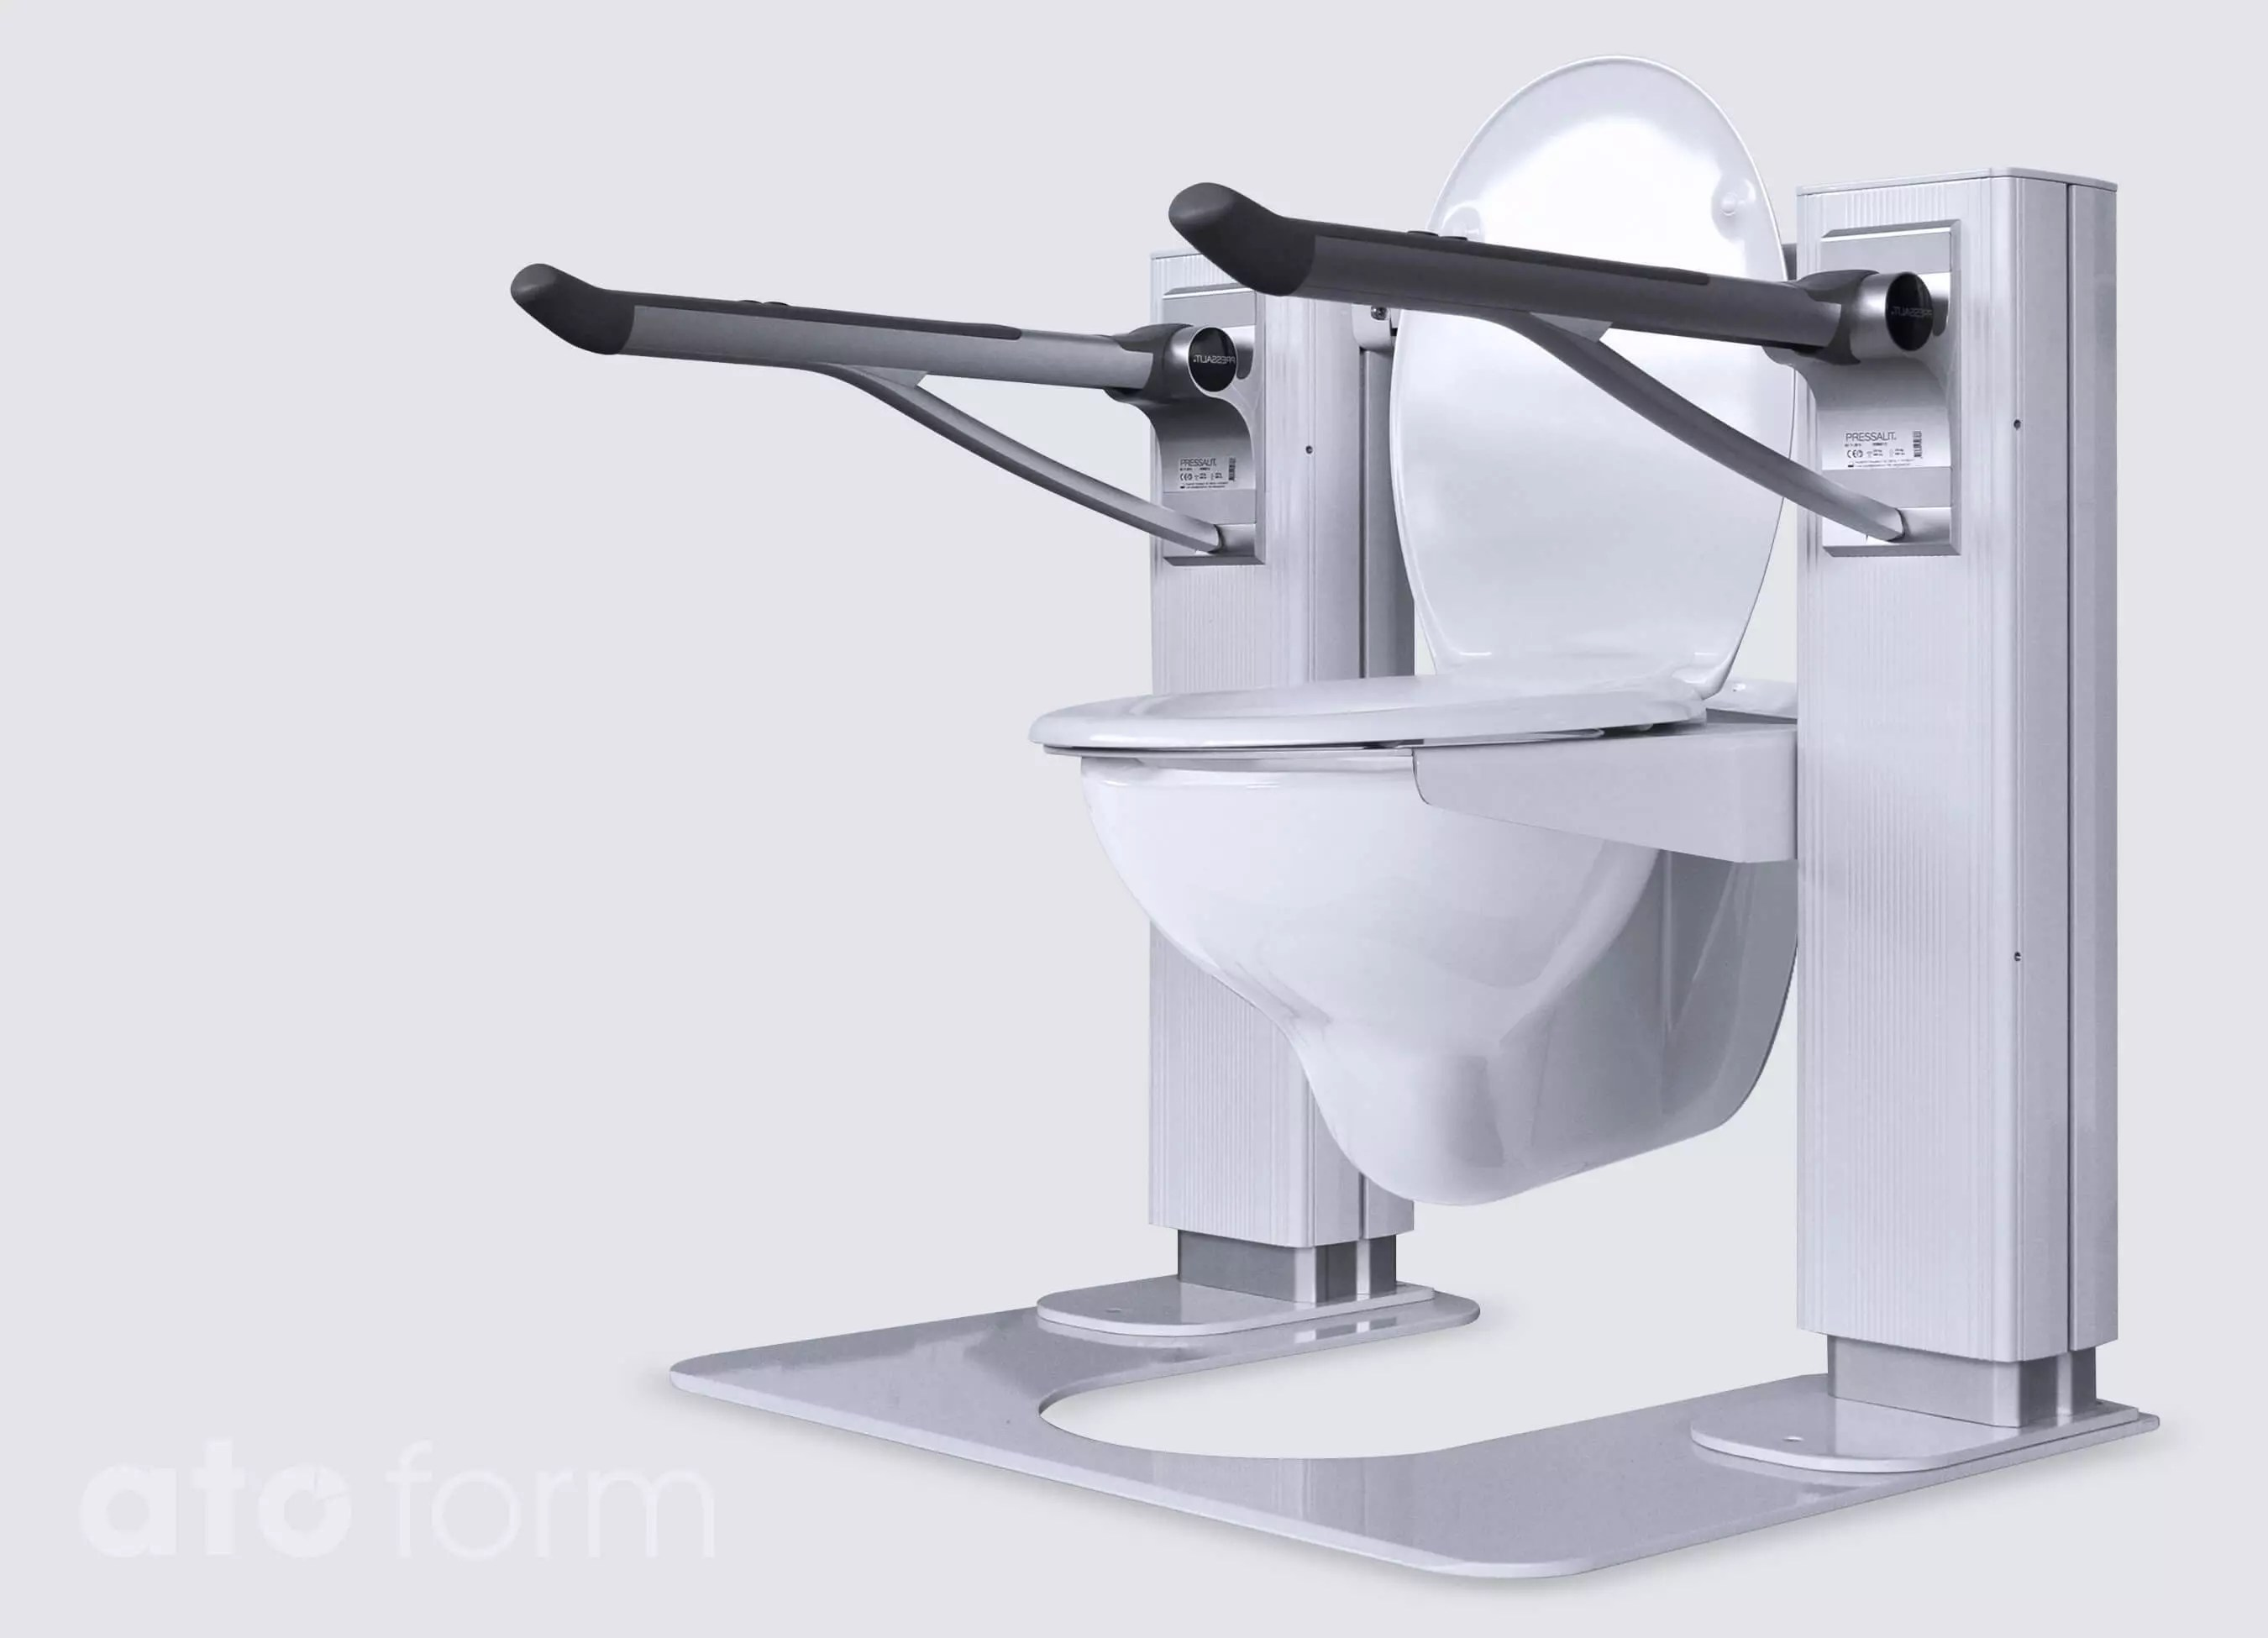 toilet seat lift liftolet